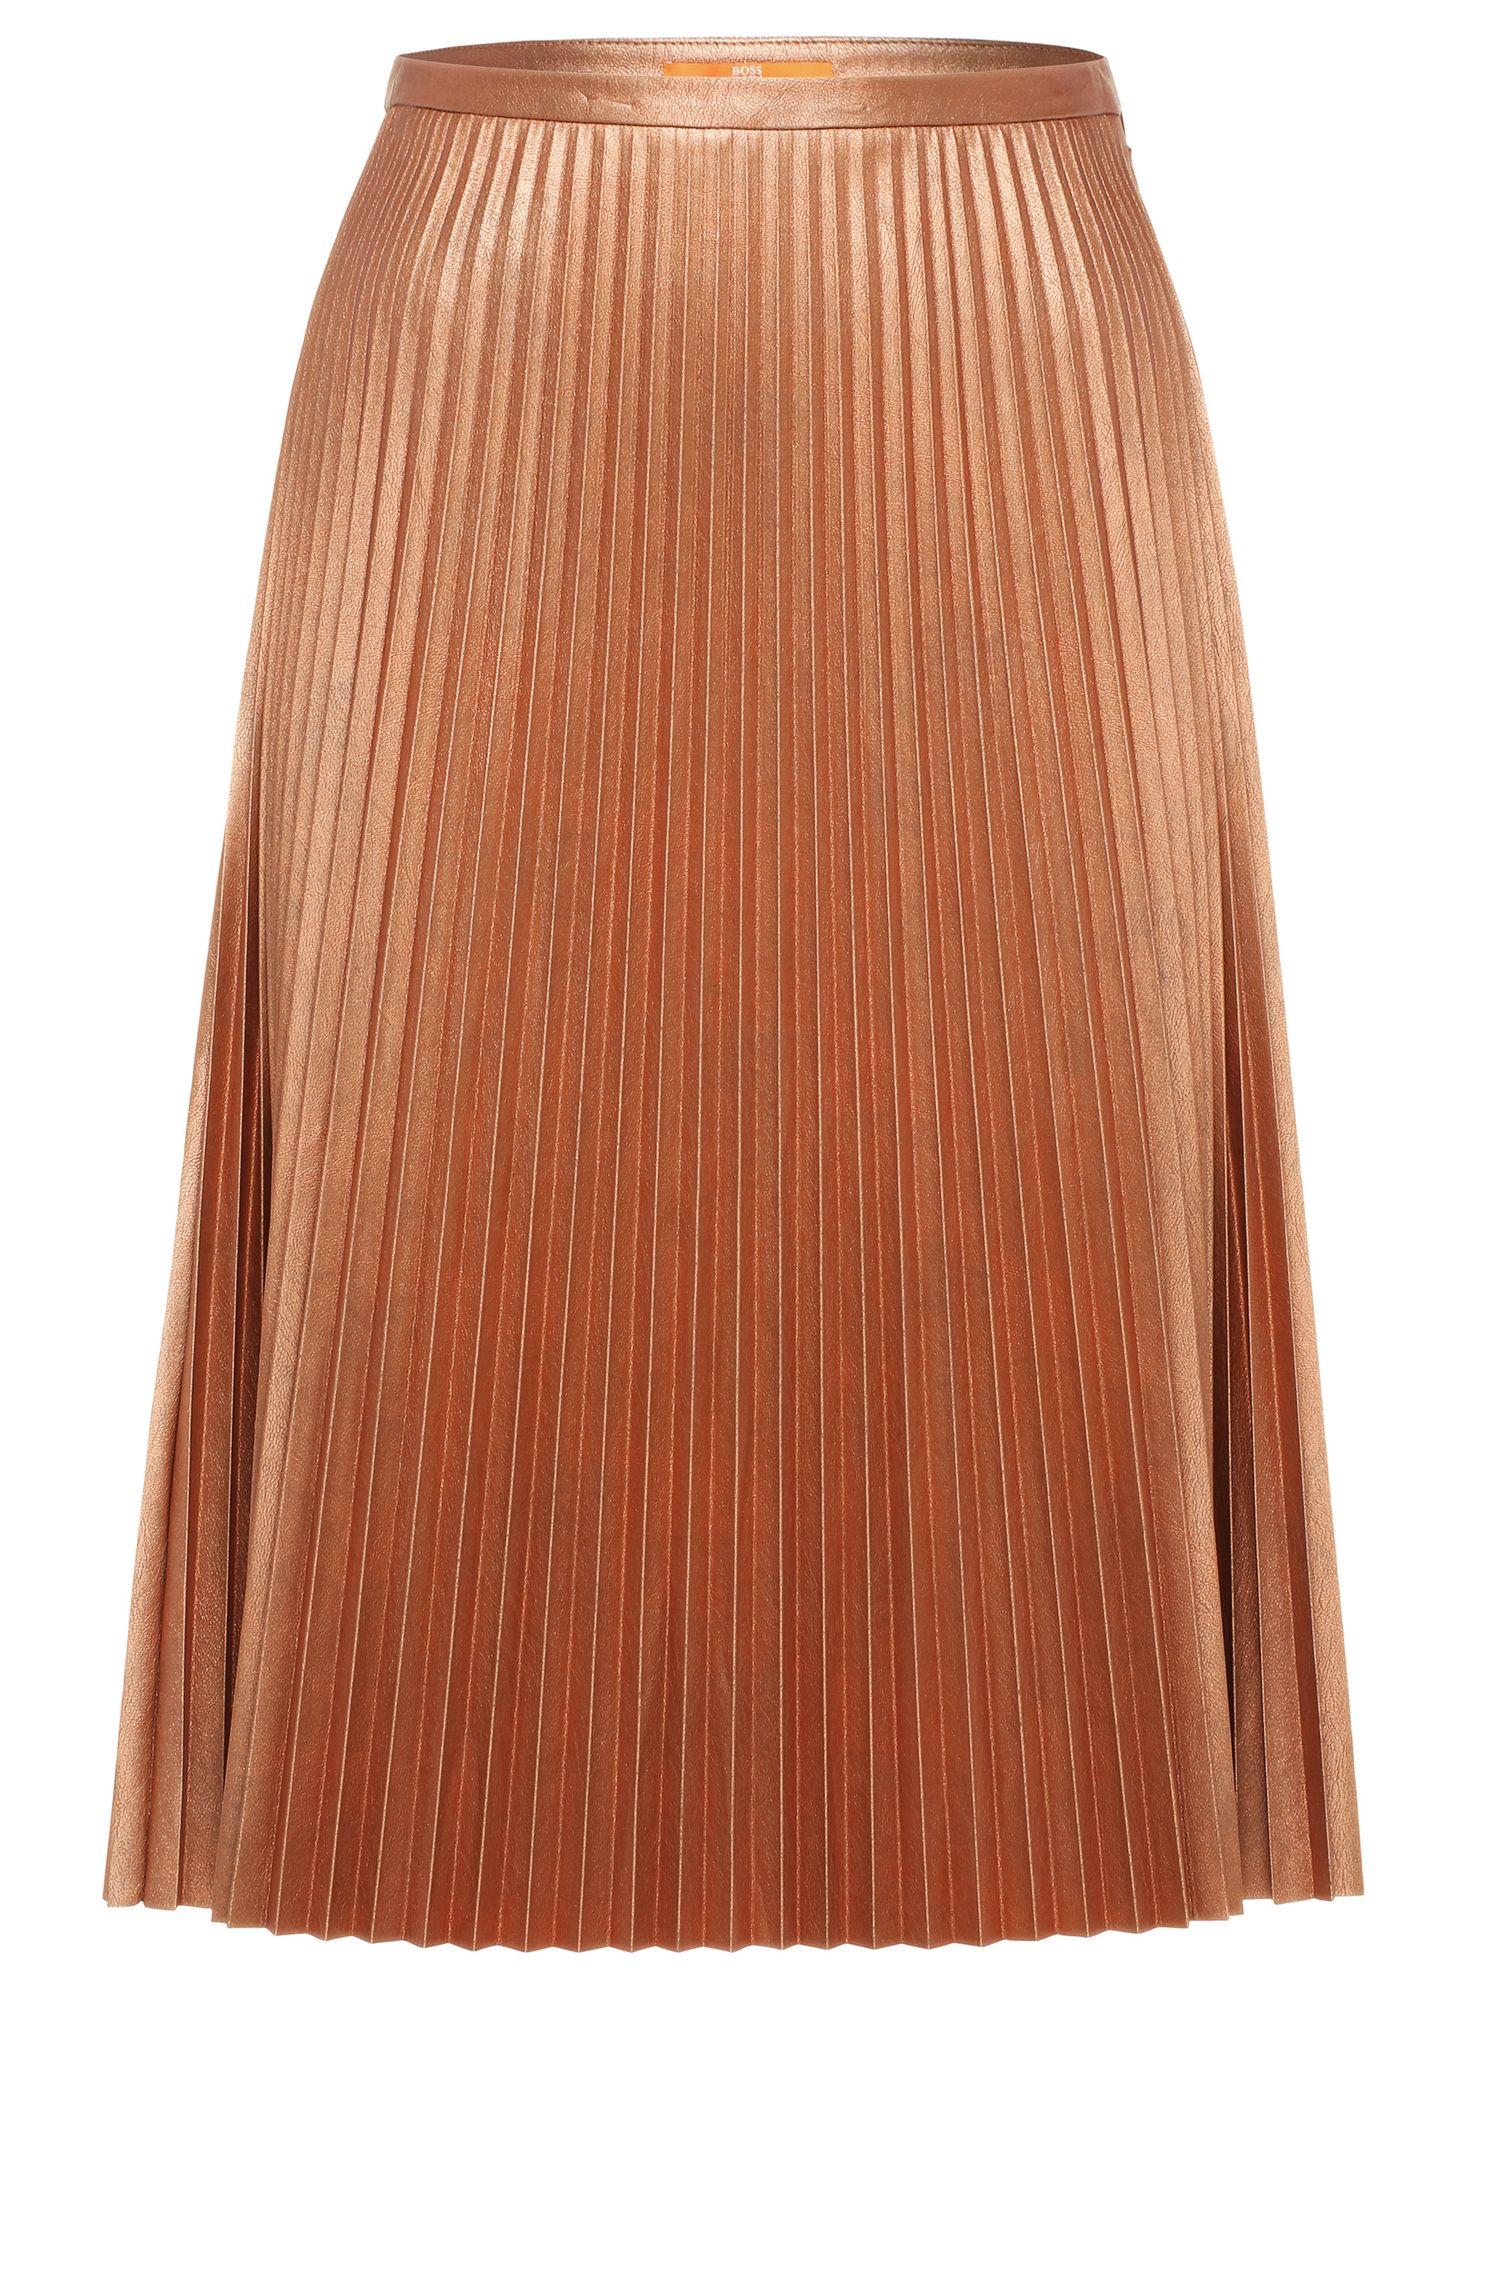 Pleated skirt in fabric blend with metallic effect: 'Baledina'